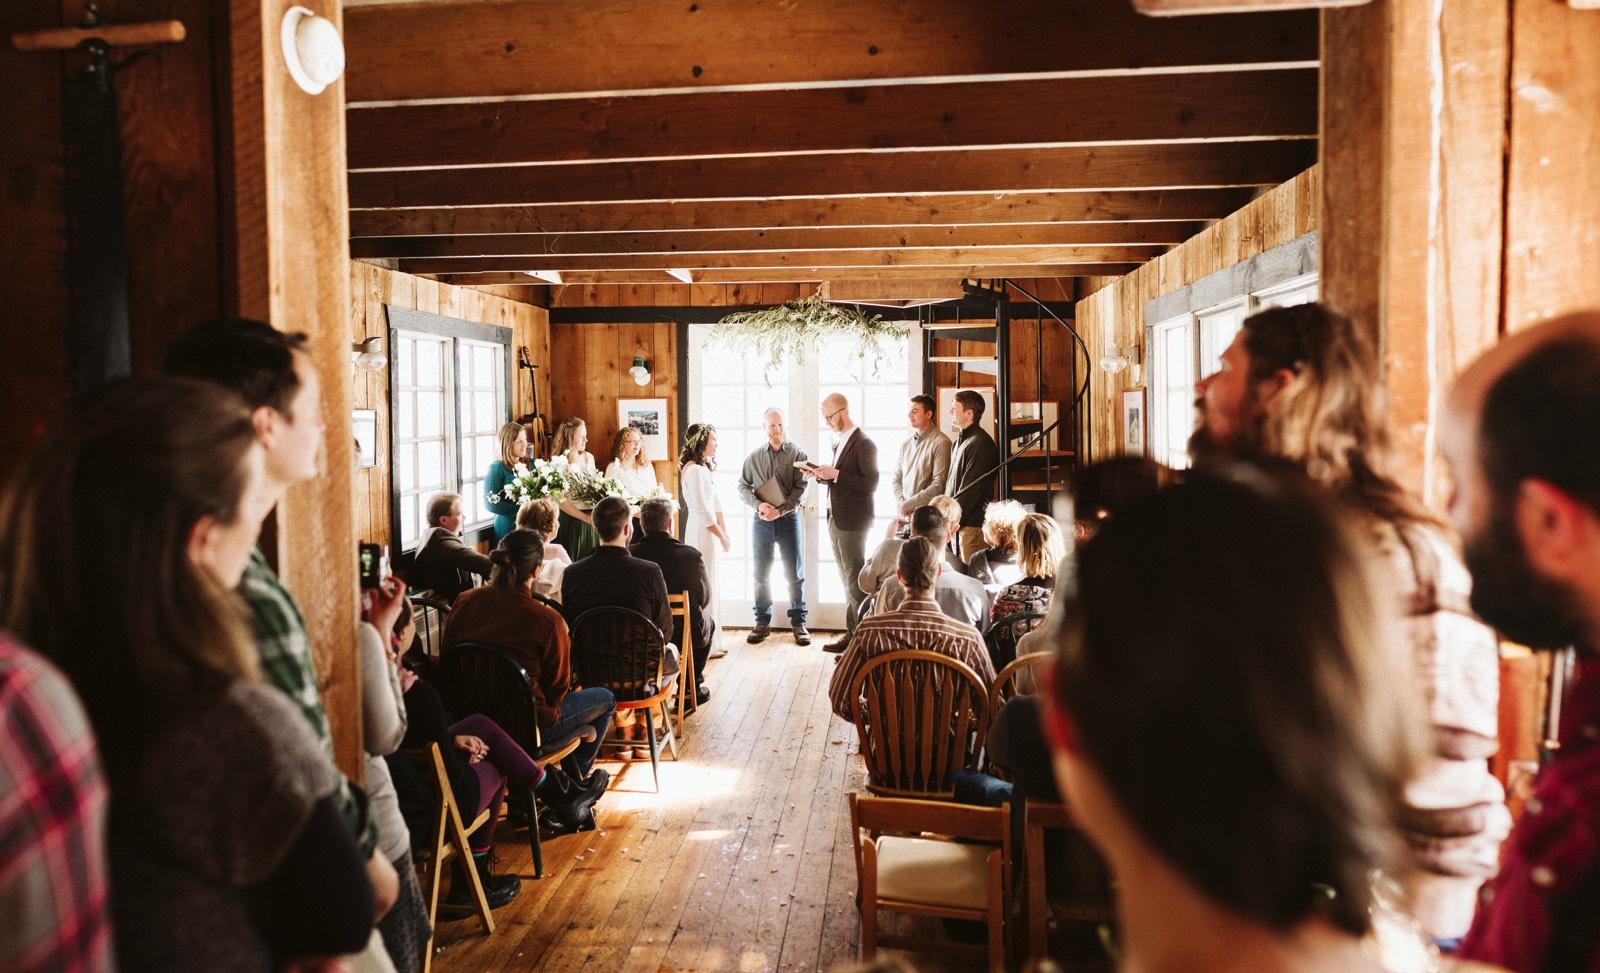 alpine-lakes-high-camp-winter-wedding-30 ALPINE LAKES HIGH CAMP WEDDING